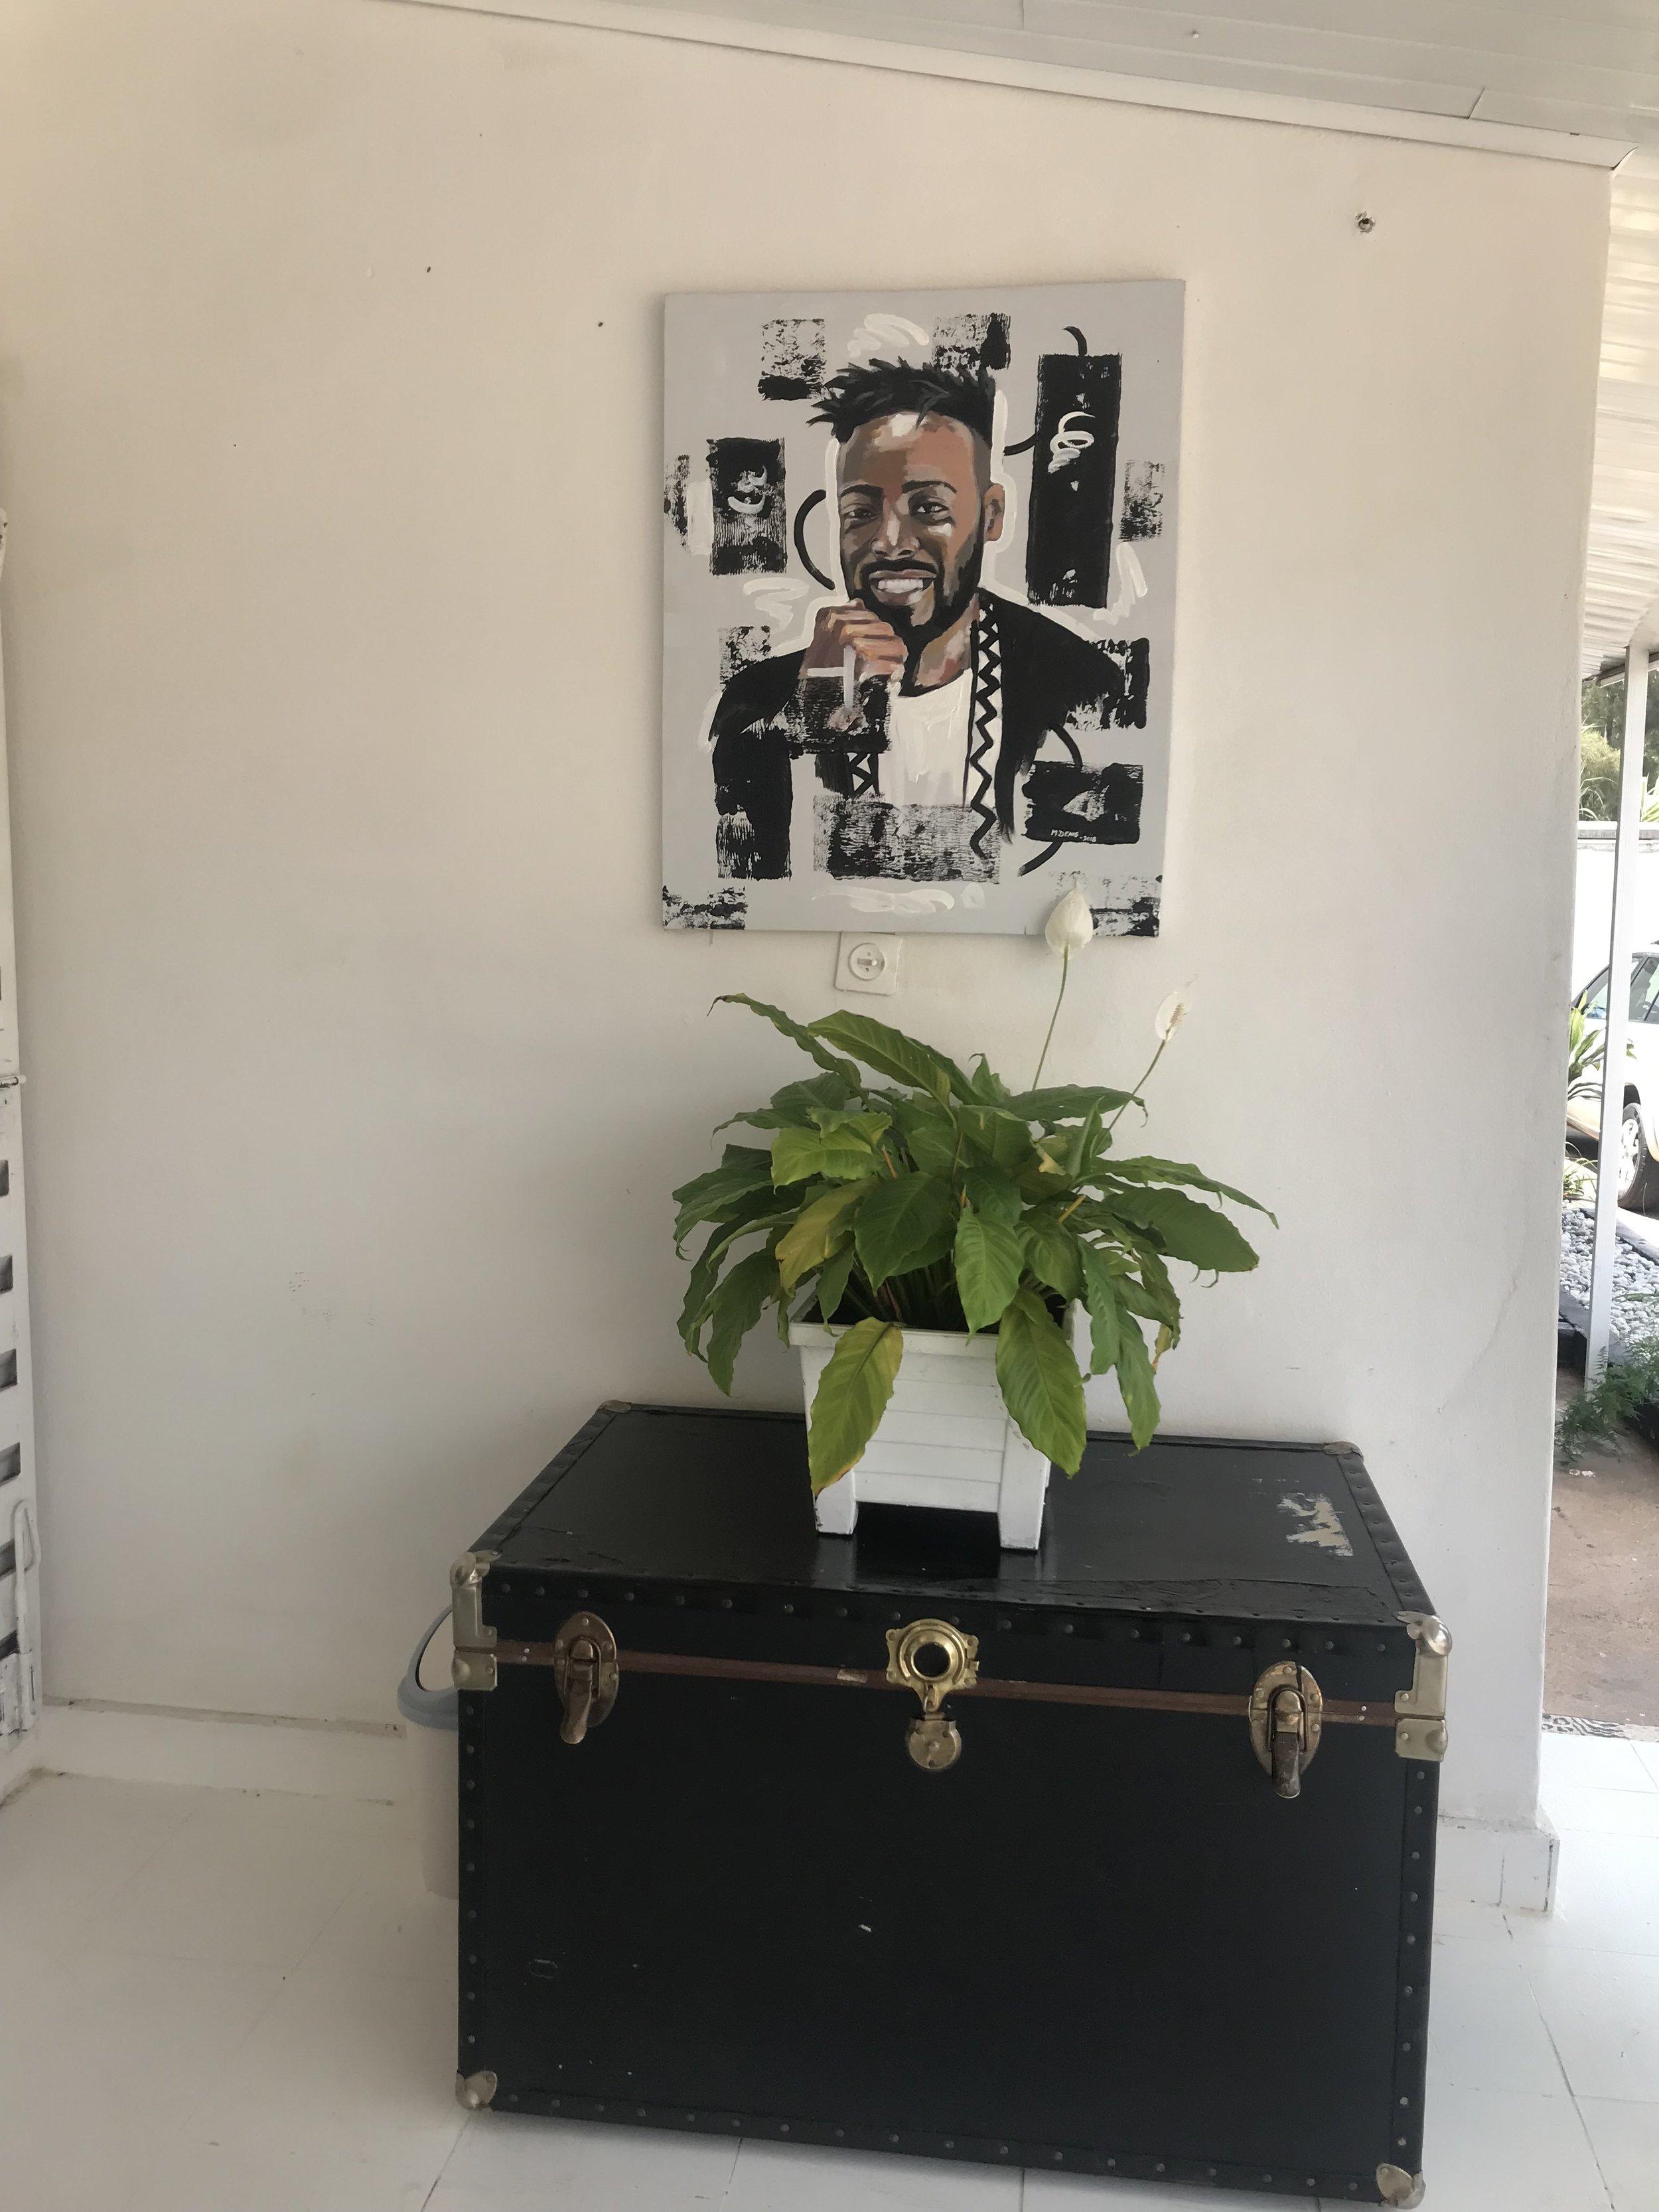 IMG_6071 2VickieRemoe-travel-kigali-rwanda-review-kwibohora25-hotels-africa.JPG